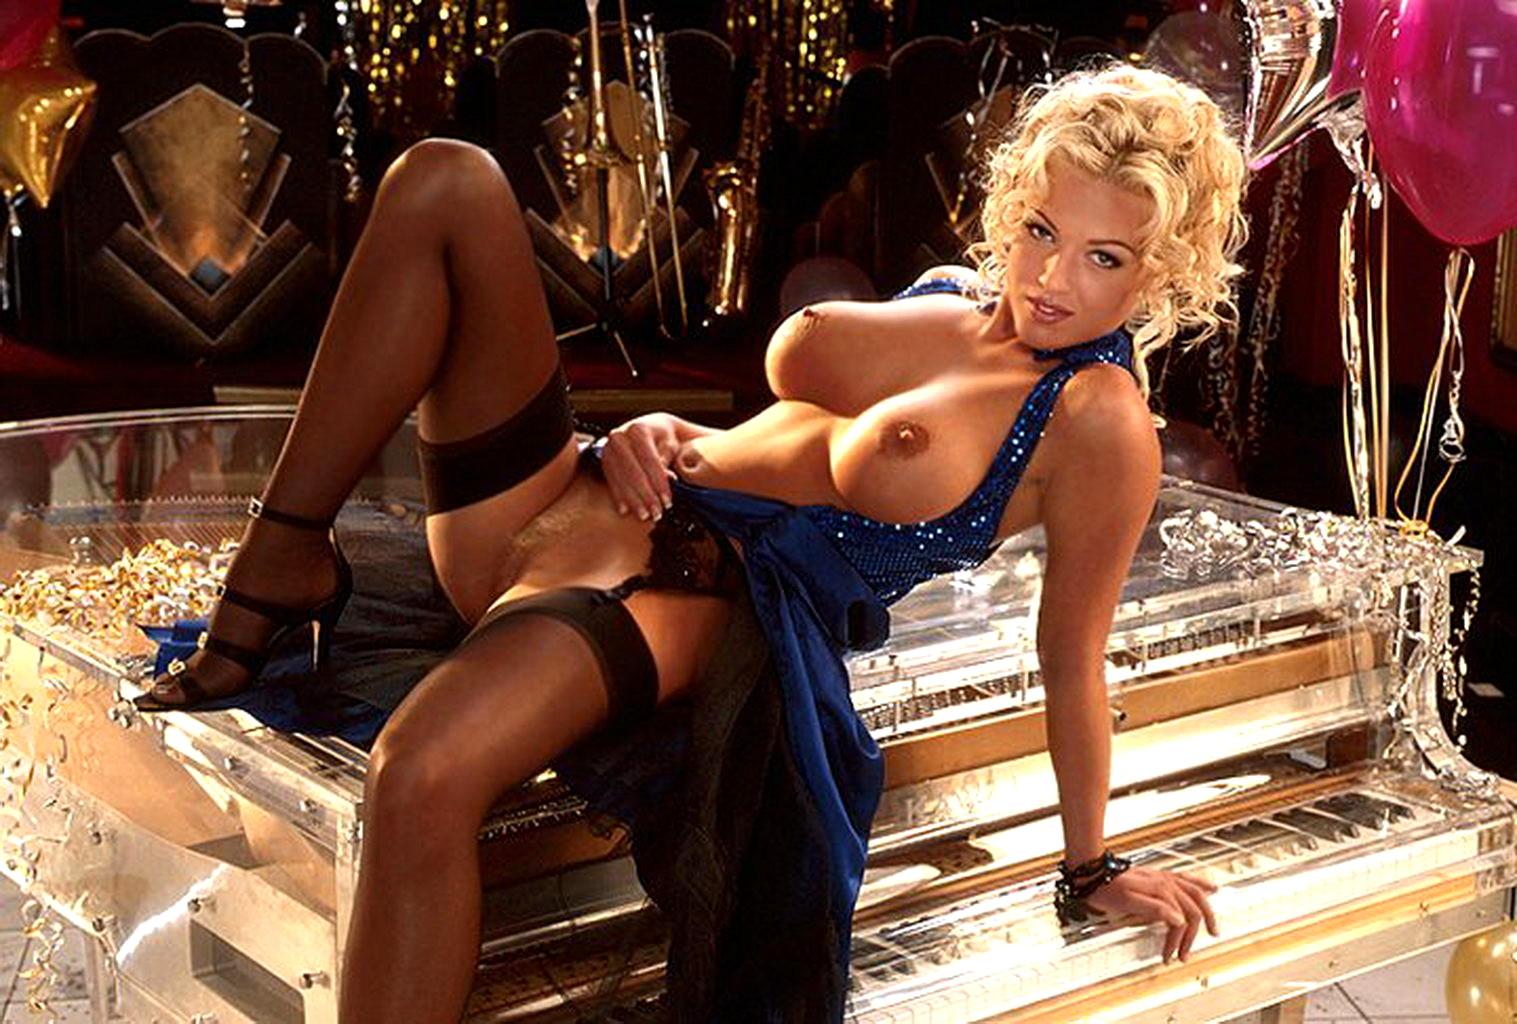 Playboyplus heather kozar tape blonde station yes porn pics xxx